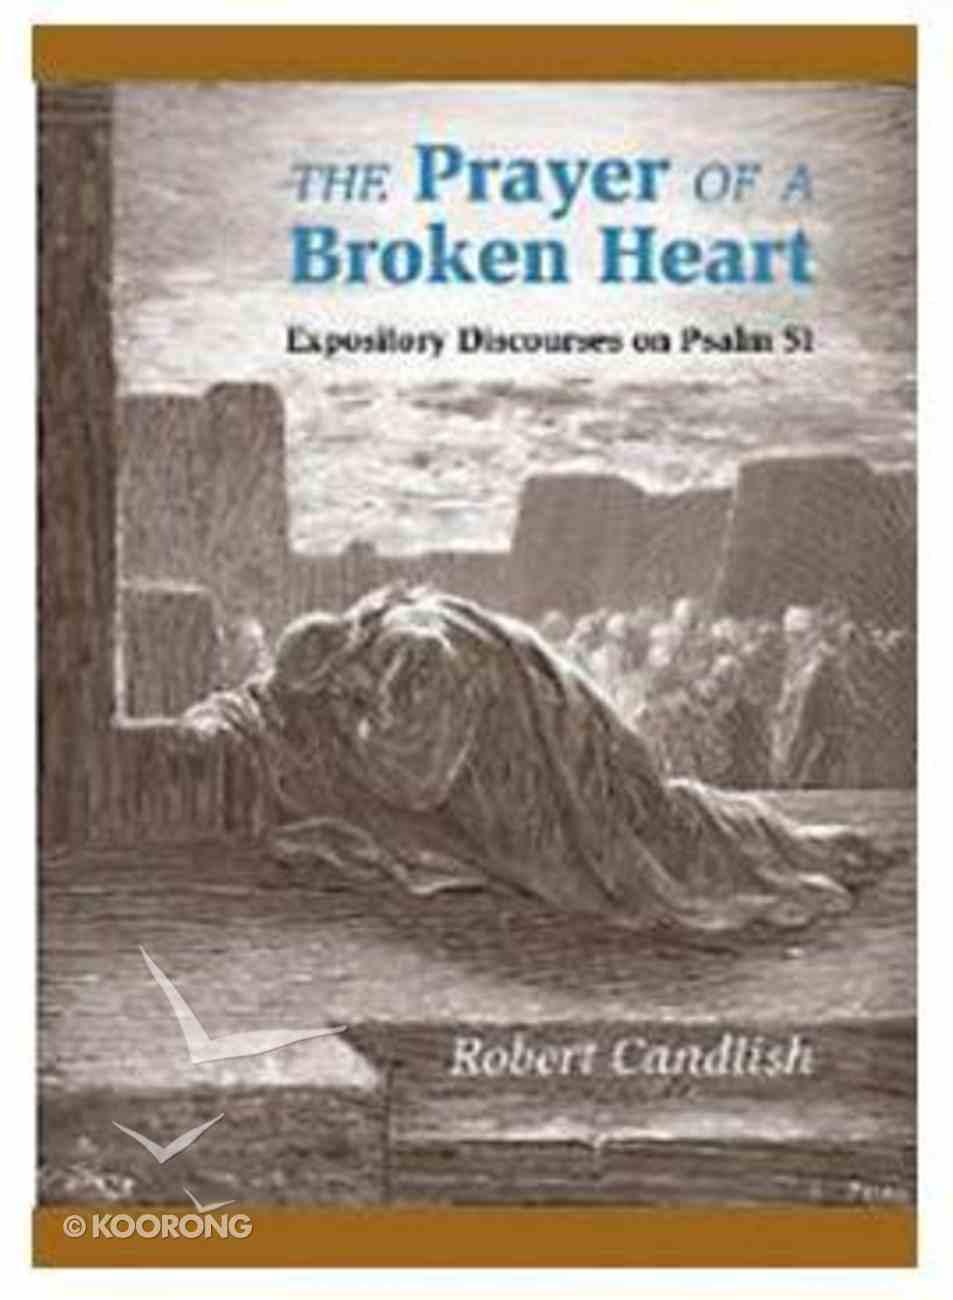 The Prayer of the Broken Heart: An Exposition of Psalm 51 Paperback